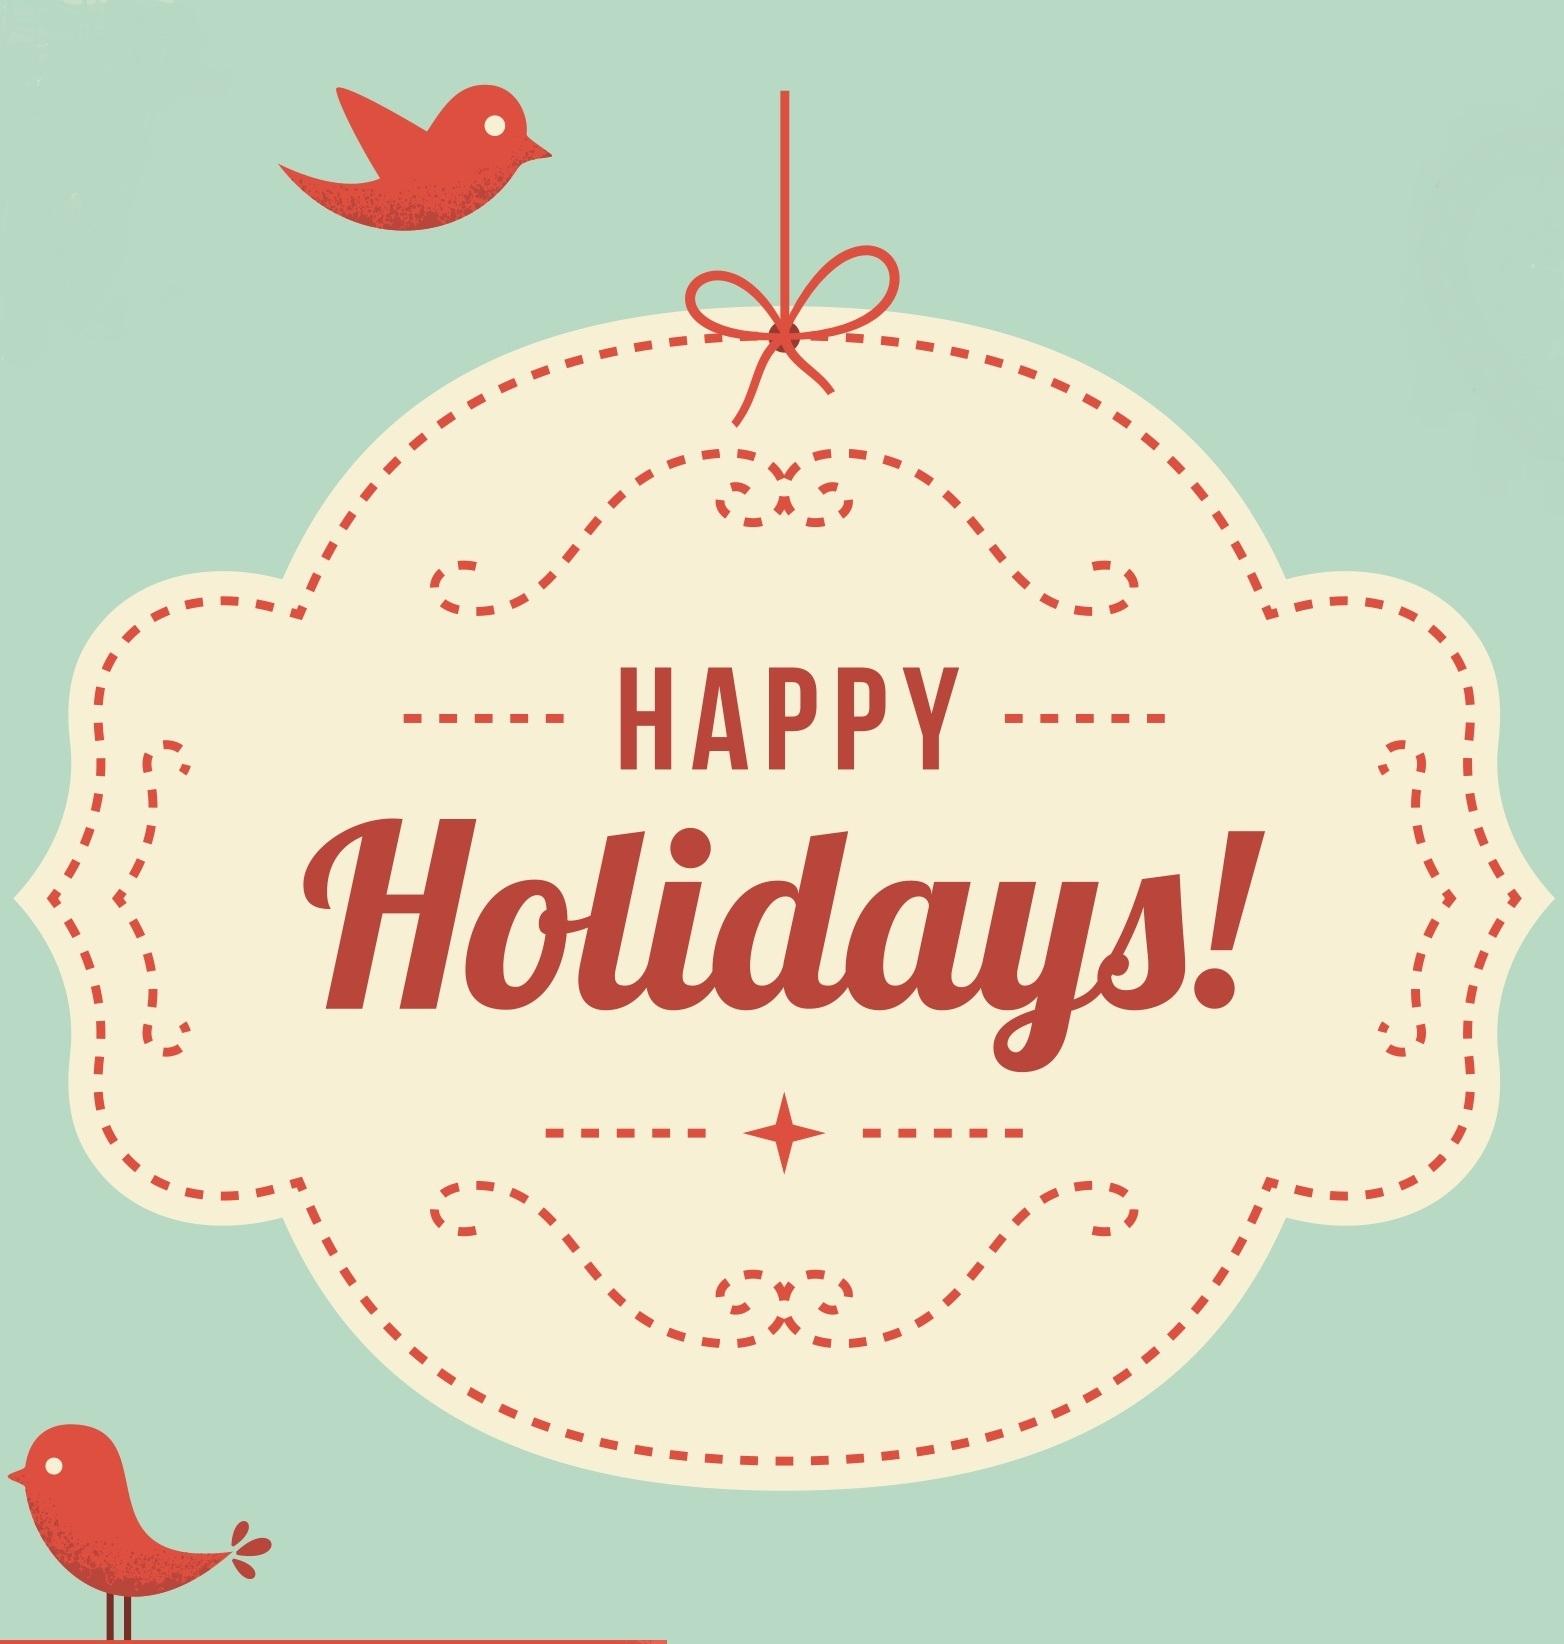 Holidays: Happy Holidays To All!